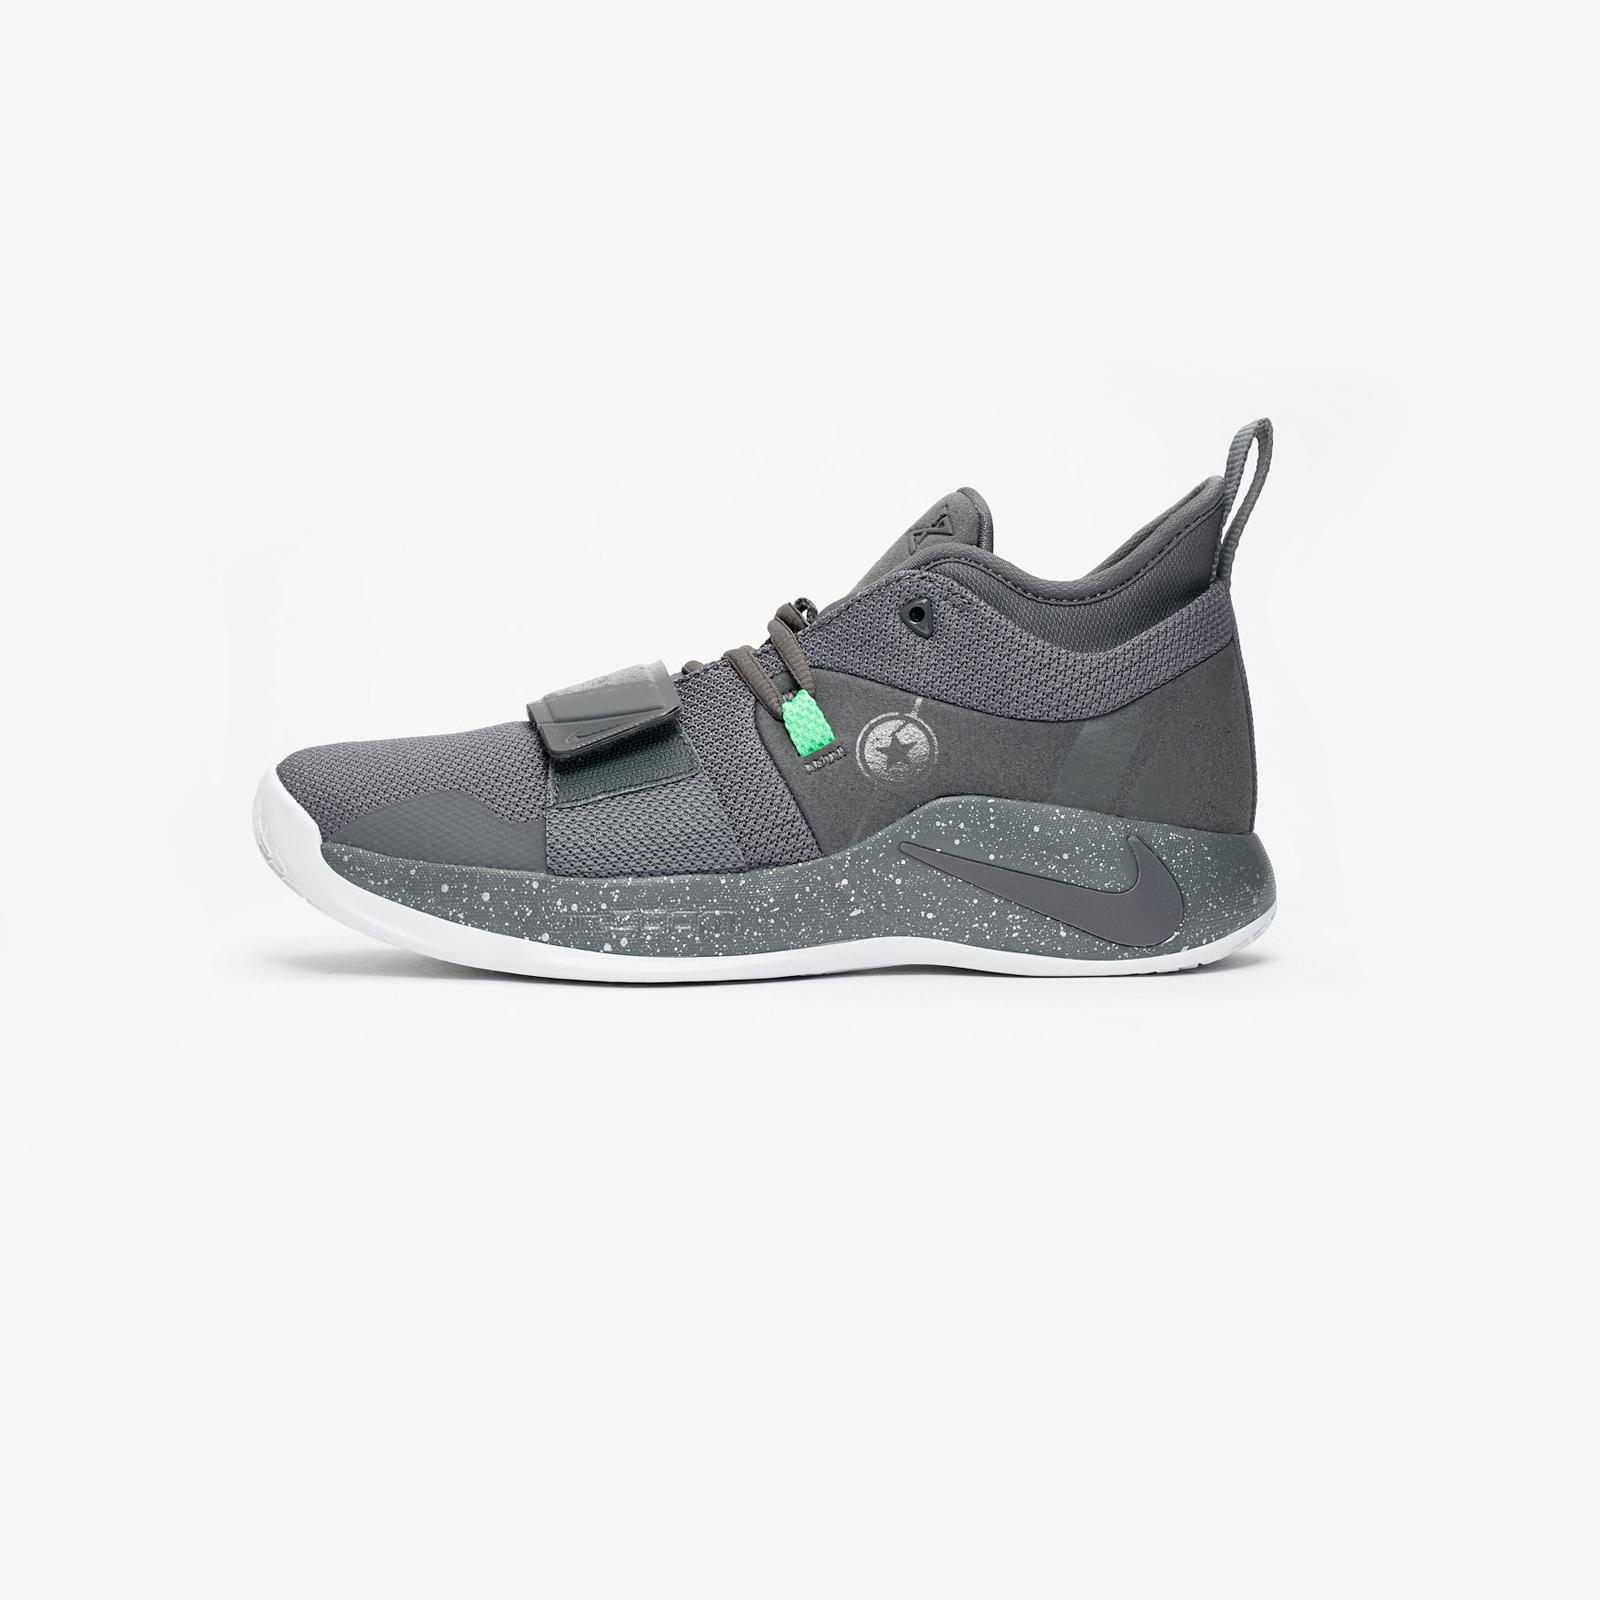 7d277cbb5469 Nike PG 2.5 - Bq8452-007 - Sneakersnstuff